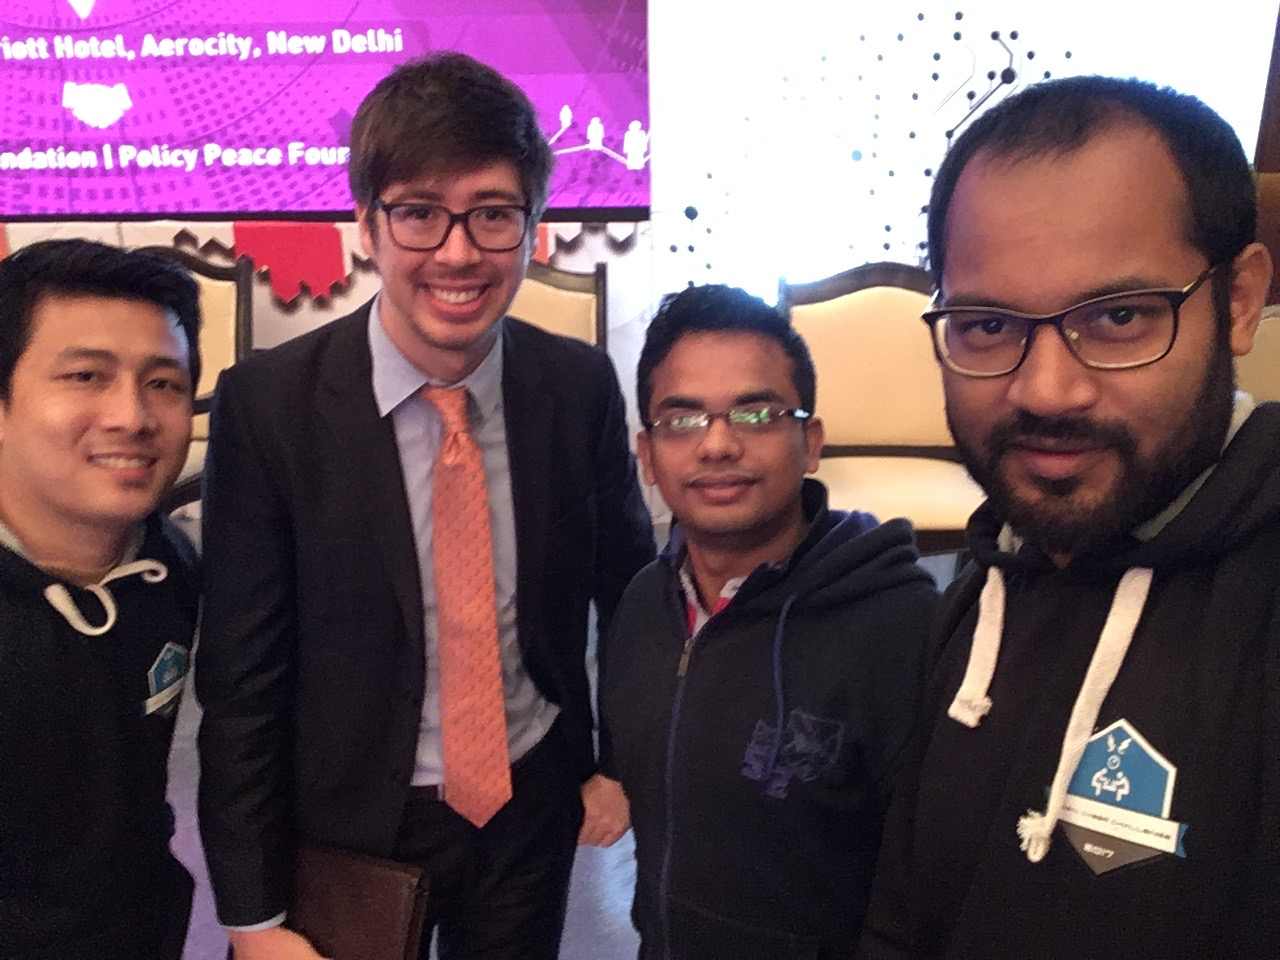 Mentoring at the GCCS Hackathon - New Delhi, IN (2017)